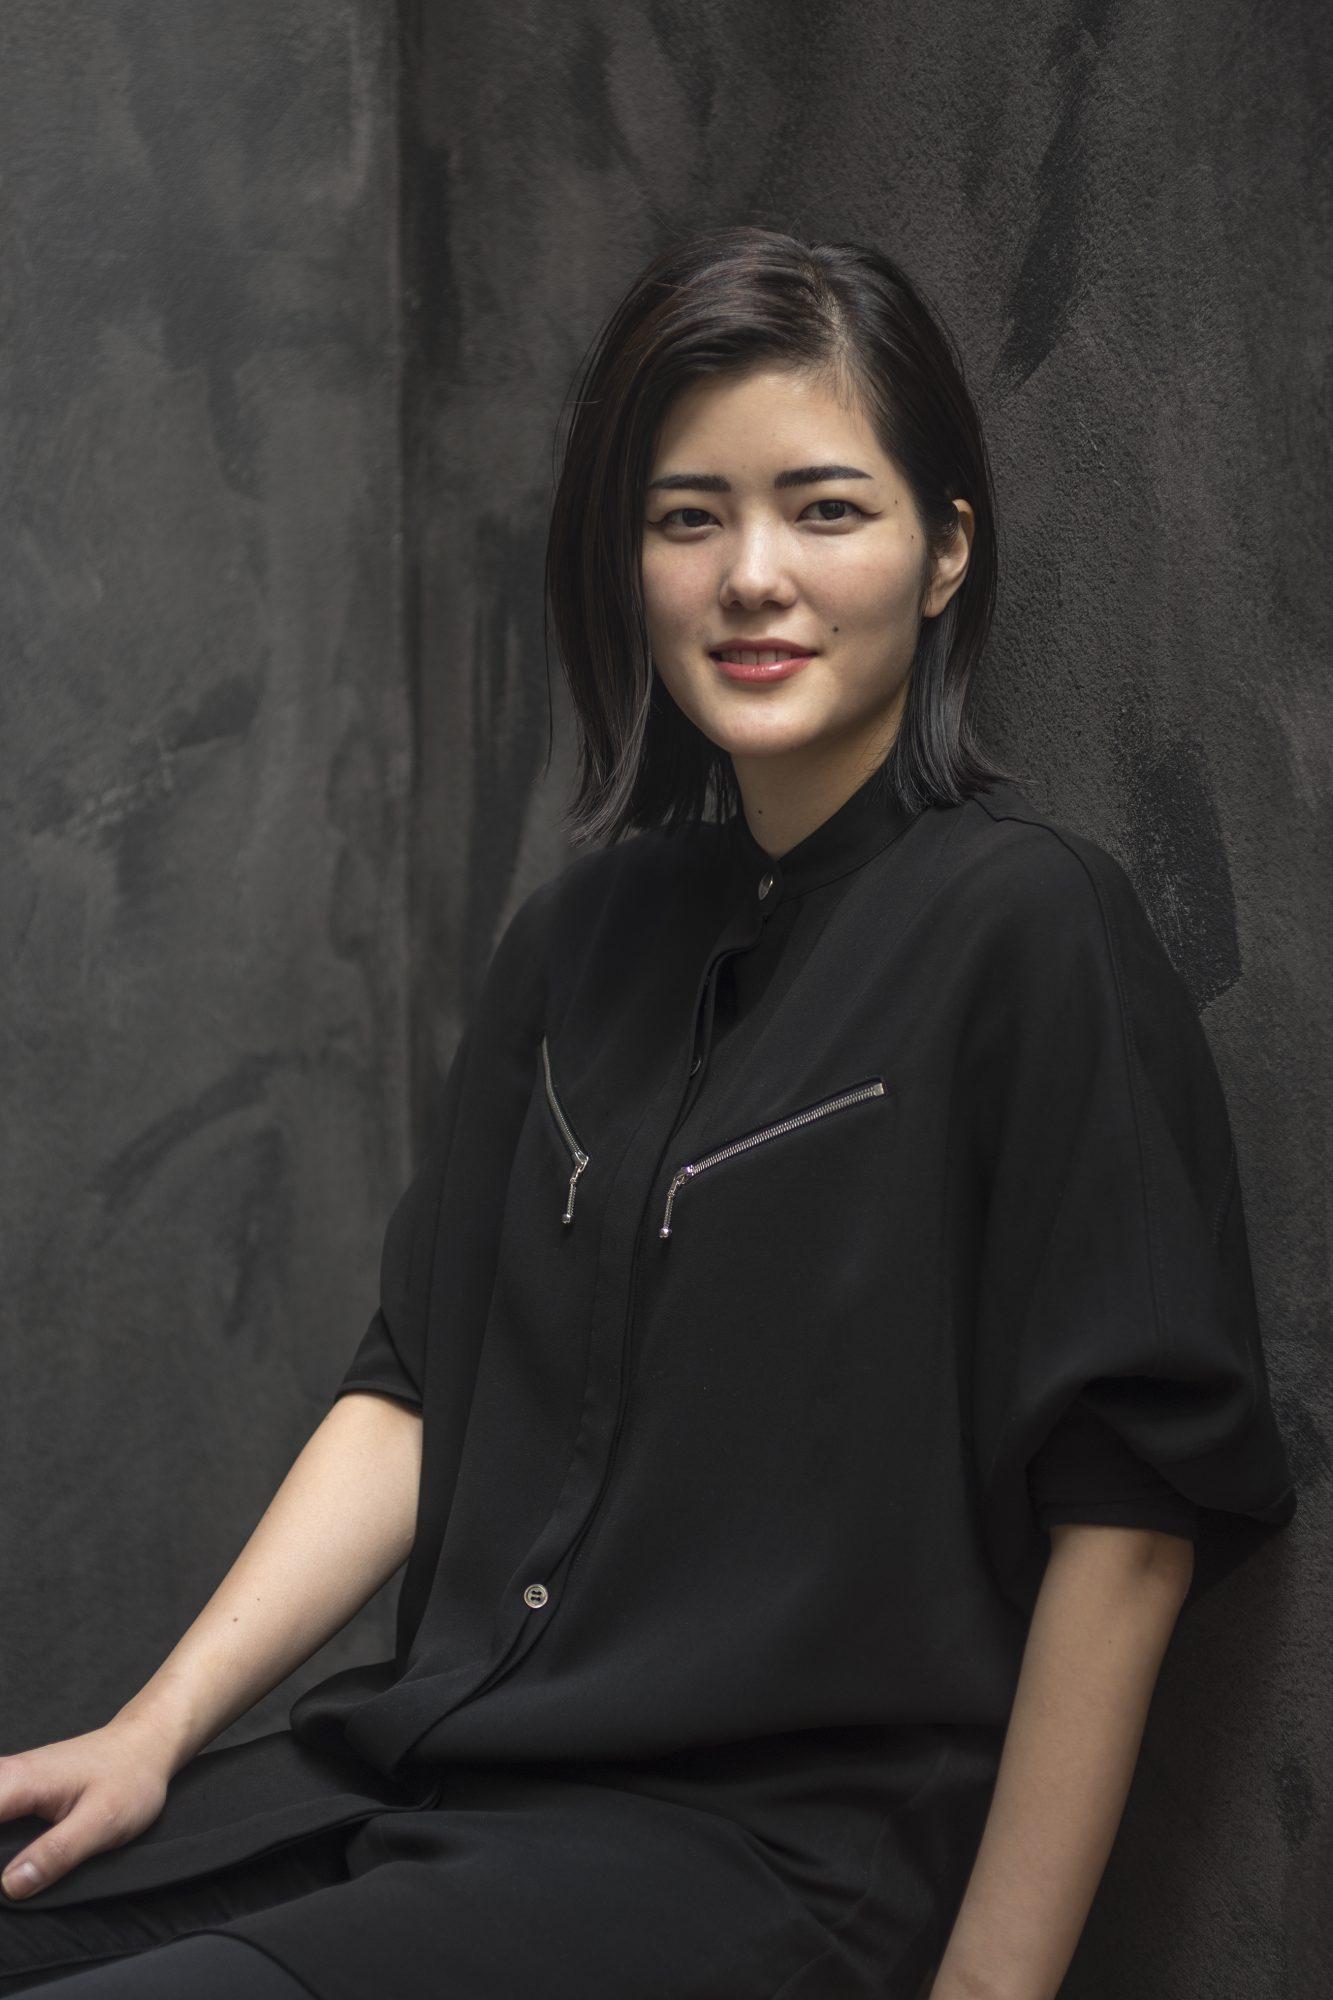 Natsuko1